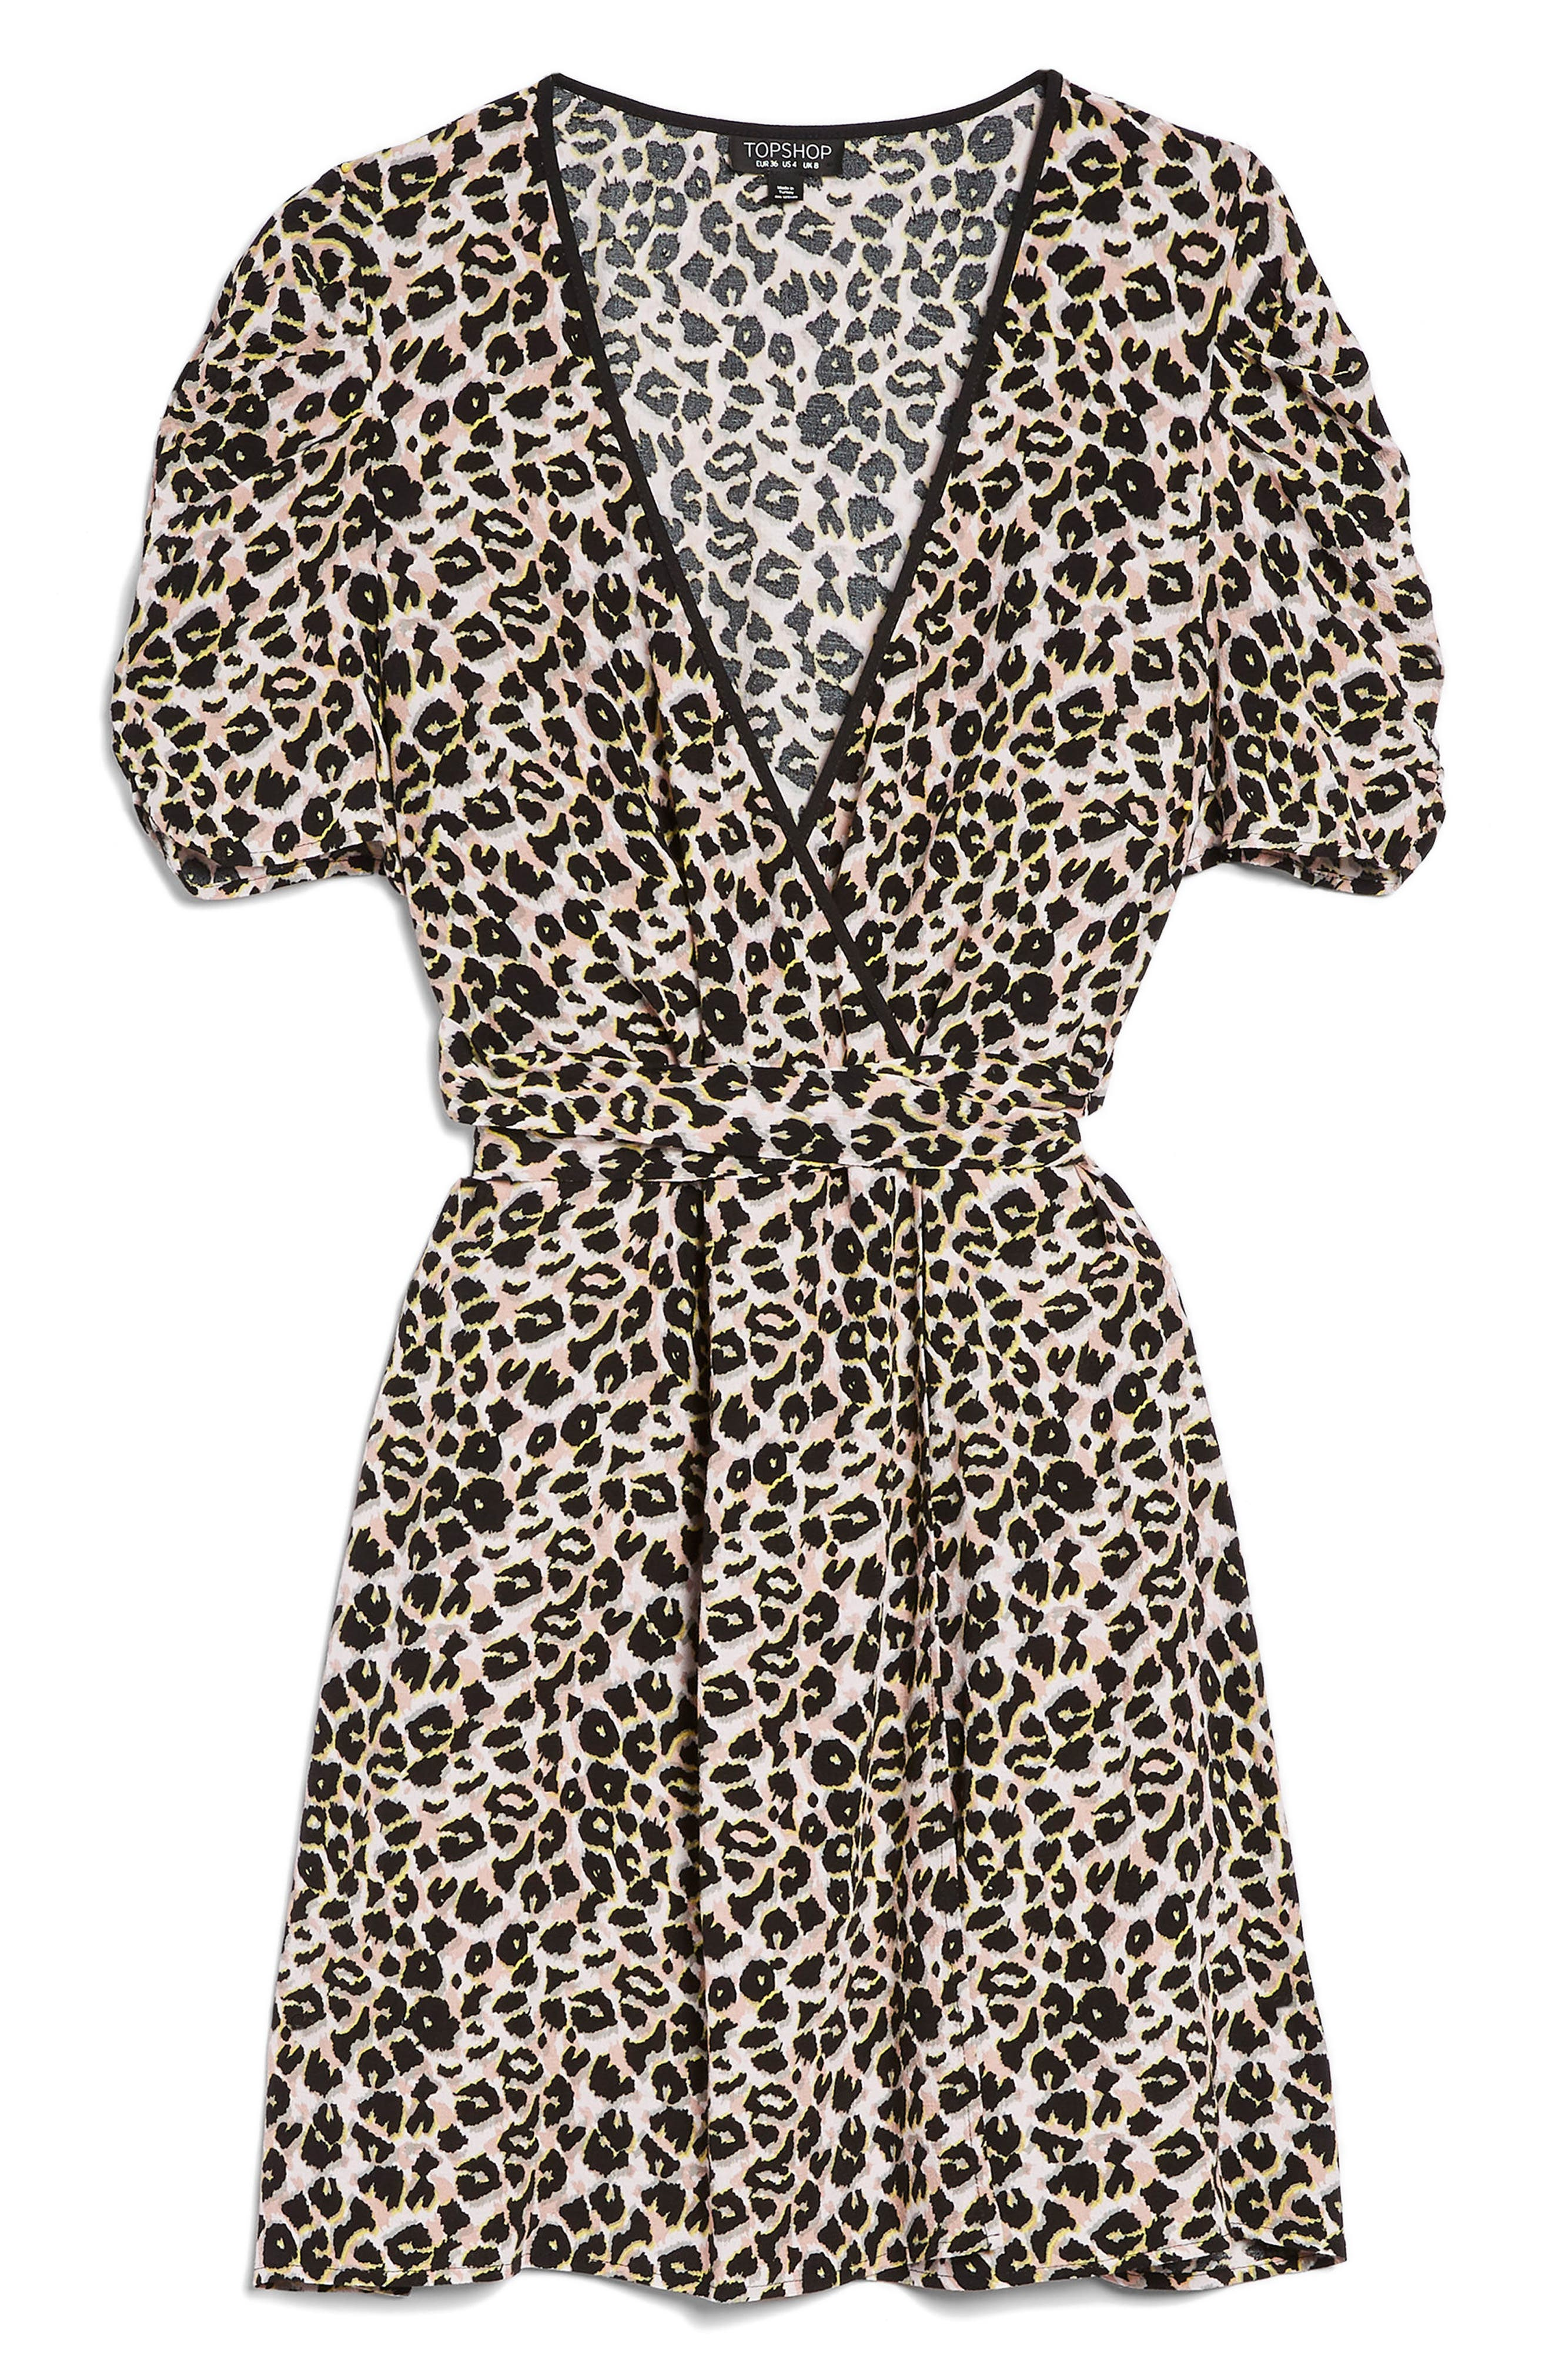 Leopard Wrap Minidress,                             Alternate thumbnail 4, color,                             201